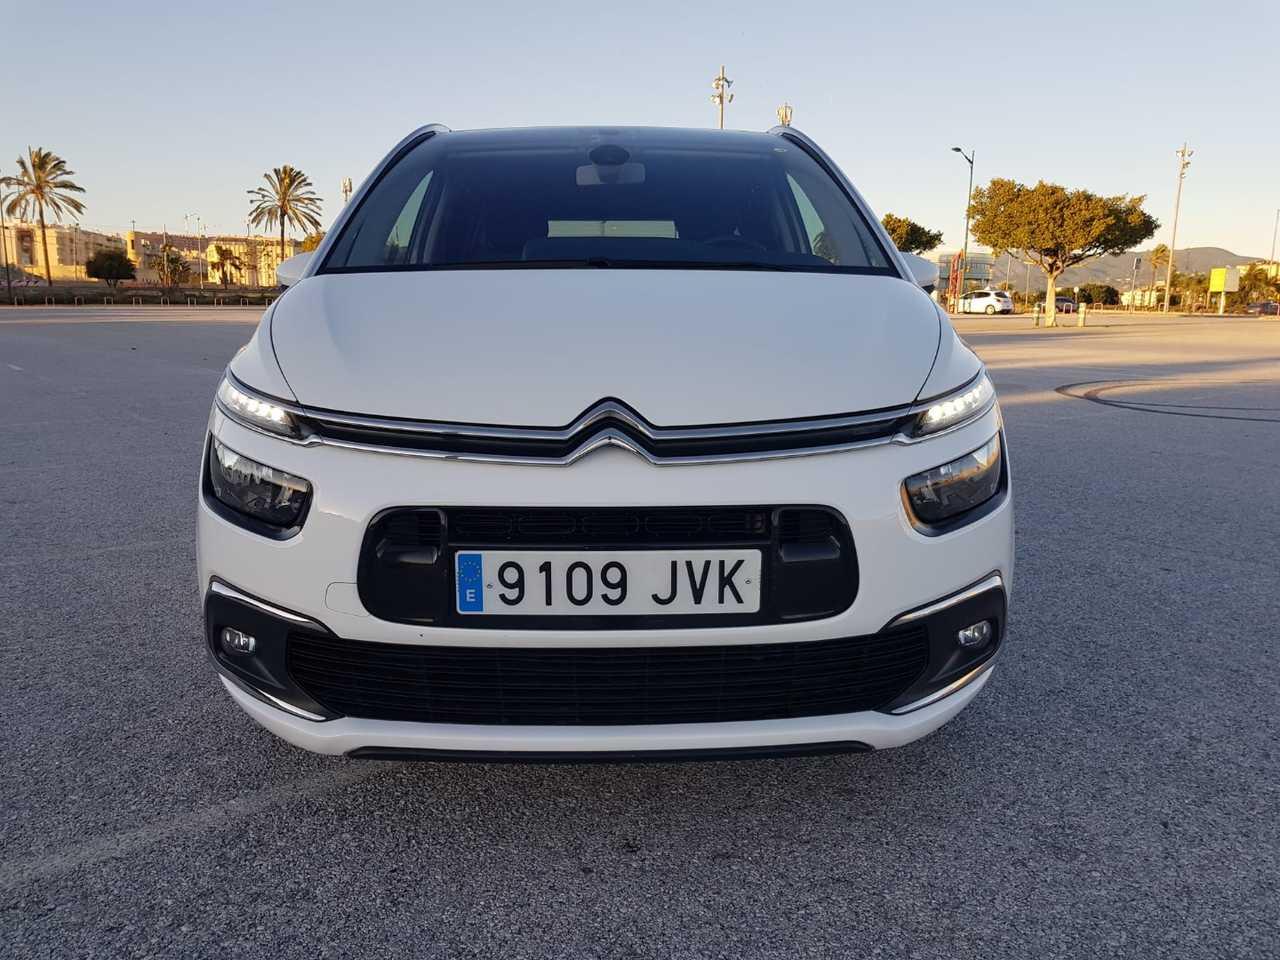 Citroën Grand C4 Picasso 1.6 HDI BLUE FEEL 120 CV EURO 6 W UN SOLO PROPIETARIO, CERTIFICADO DE KM Y CARROCERIA   - Foto 1